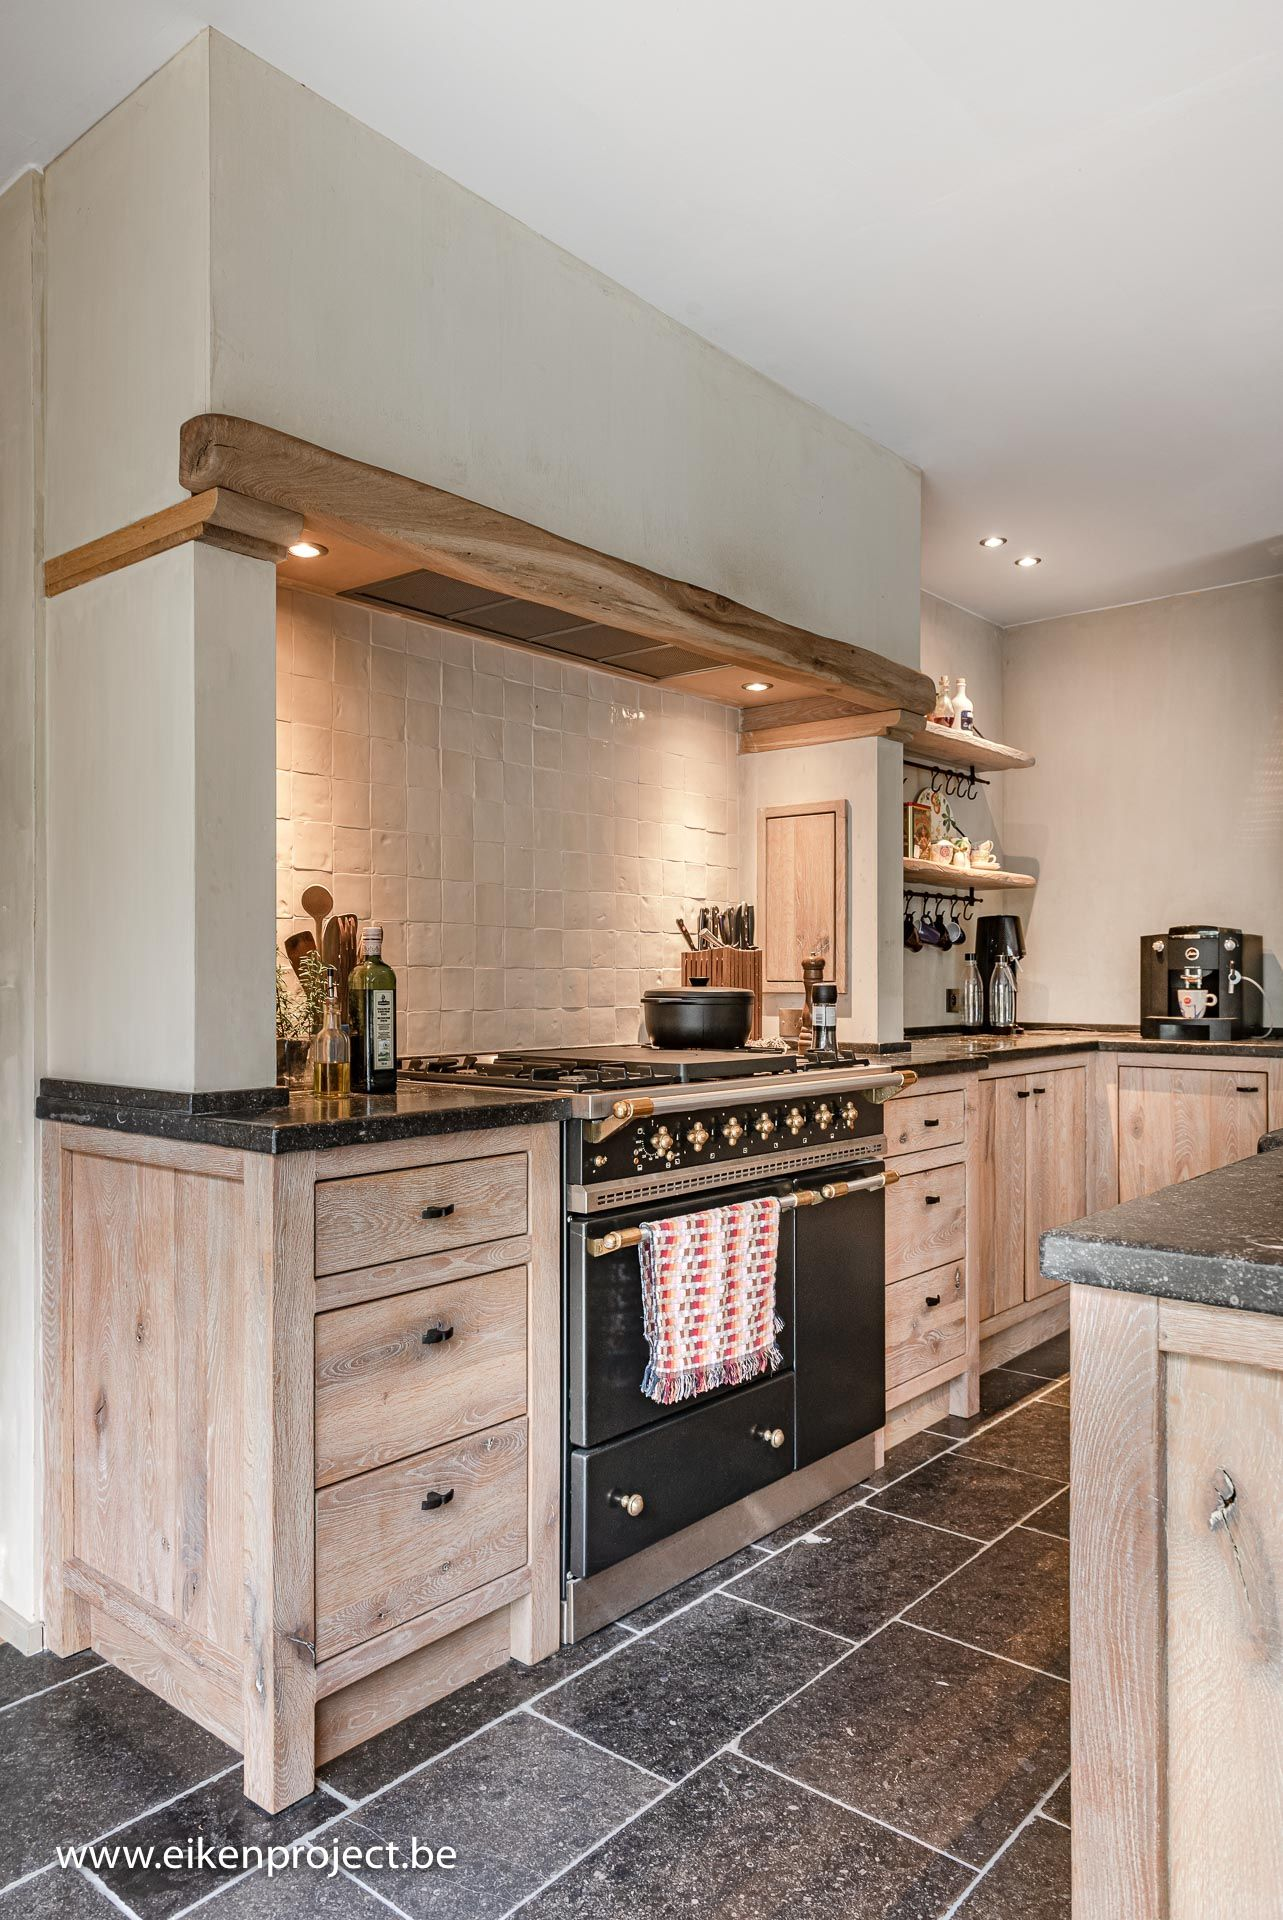 Landelijke Eiken Keuken Design De Cuisine Rustique Cuisine Moderne Decoration Interieur Maison